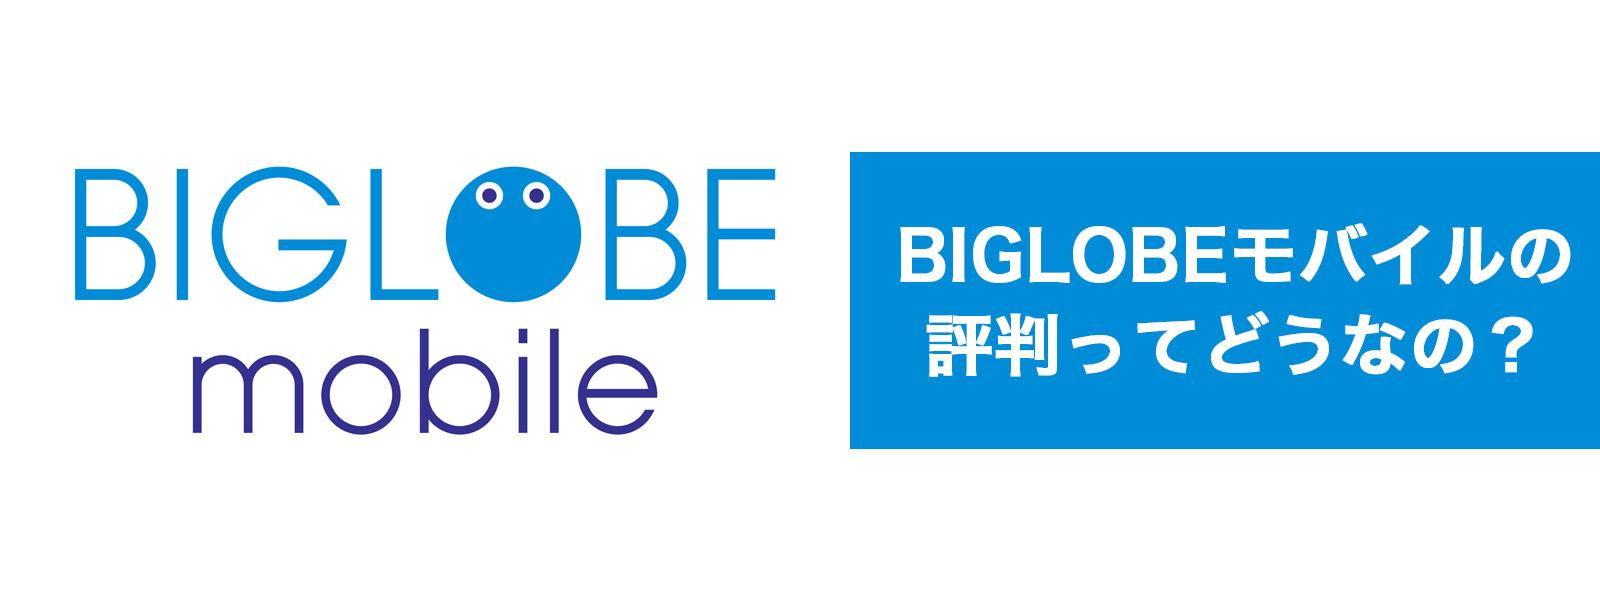 BIGLOBEモバイル評判&口コミトップバナー